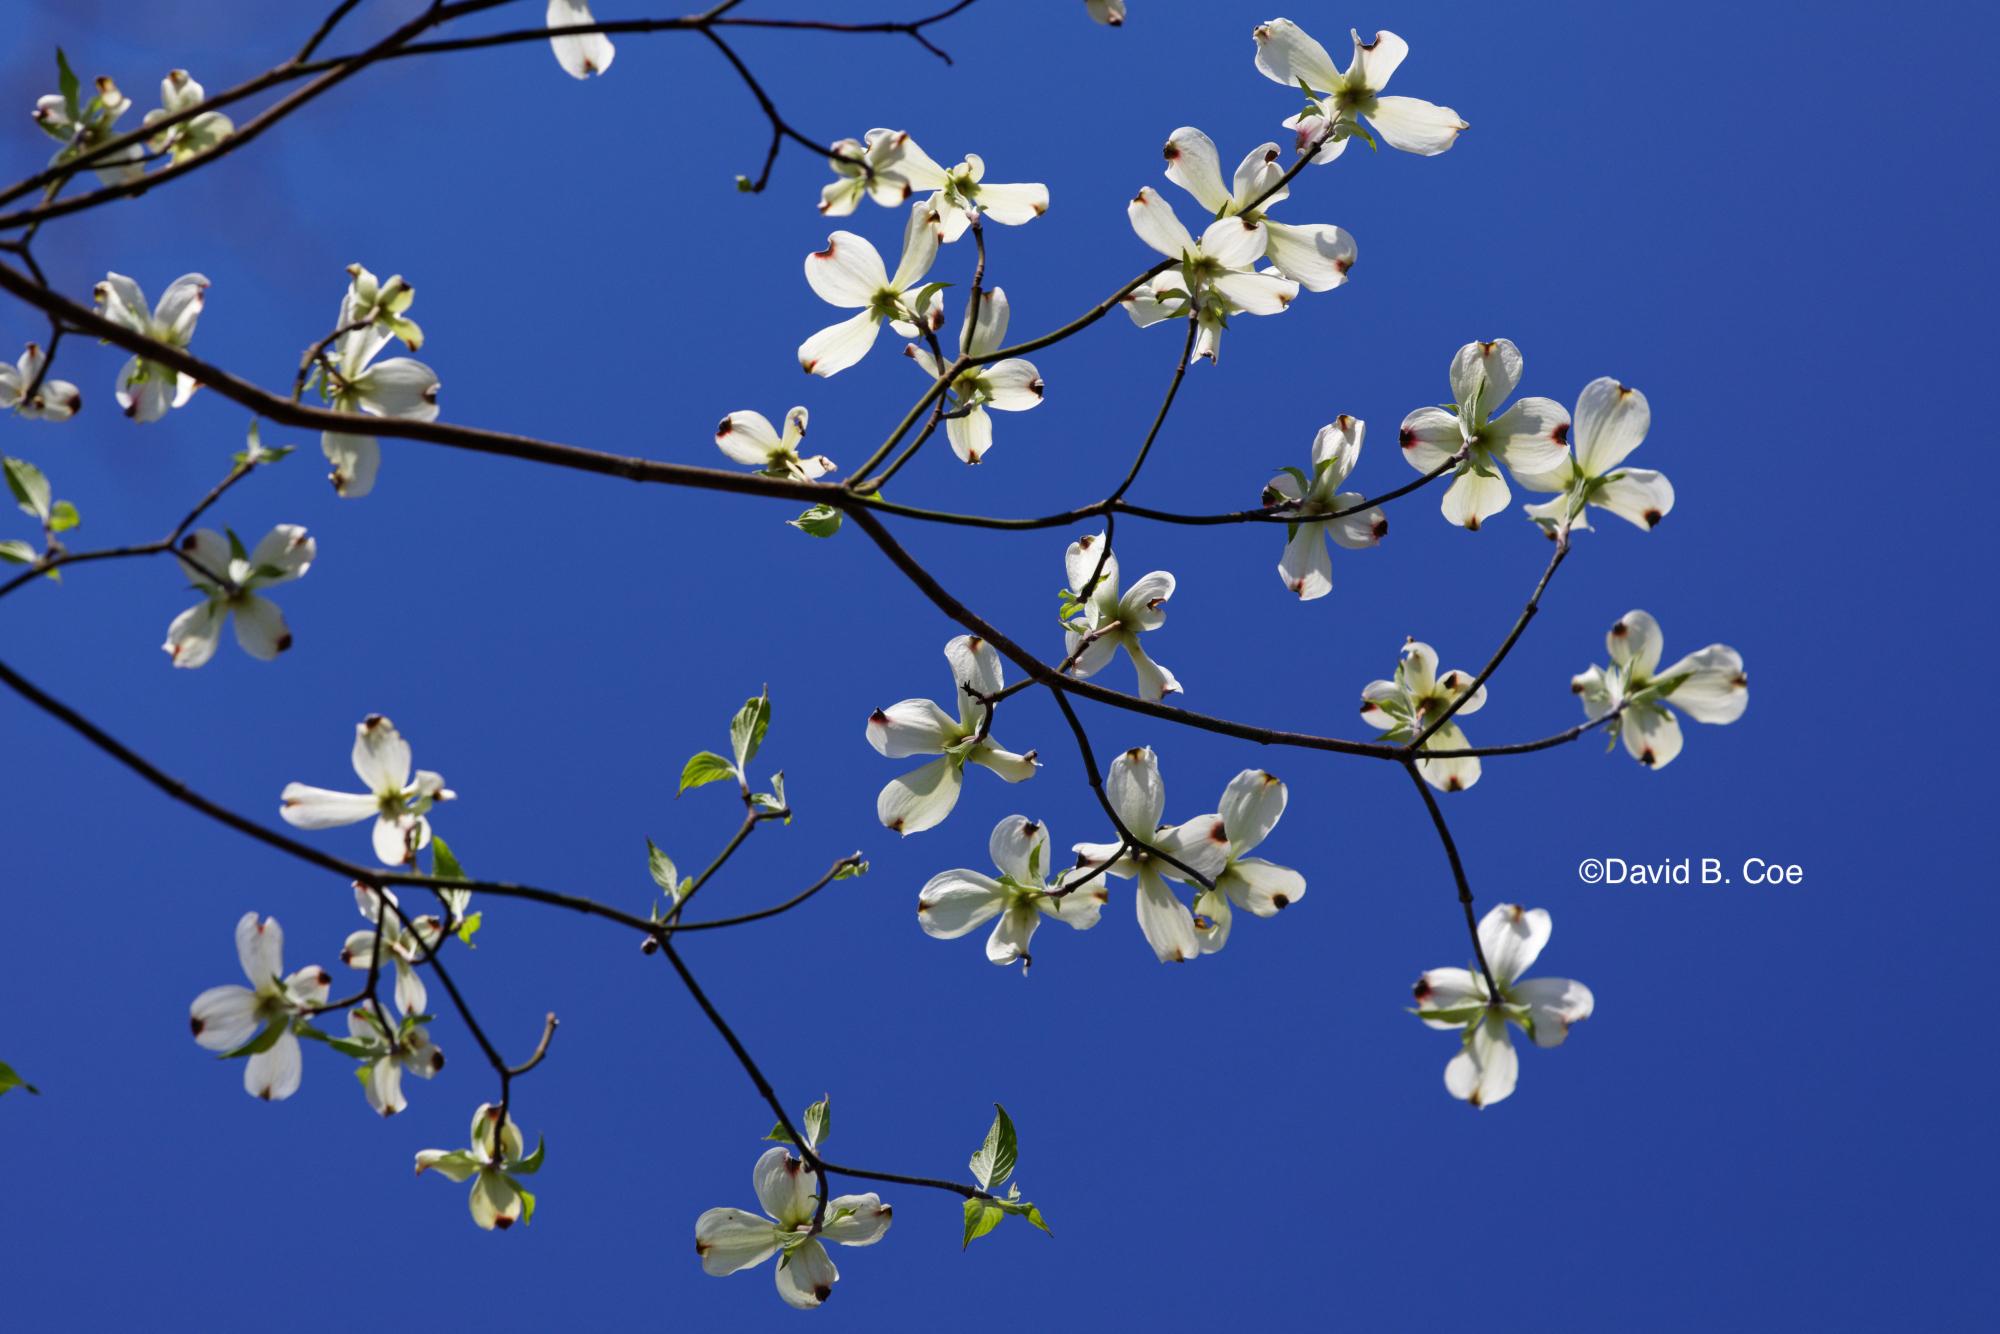 White Dogwood on Blue, by David B. Coe